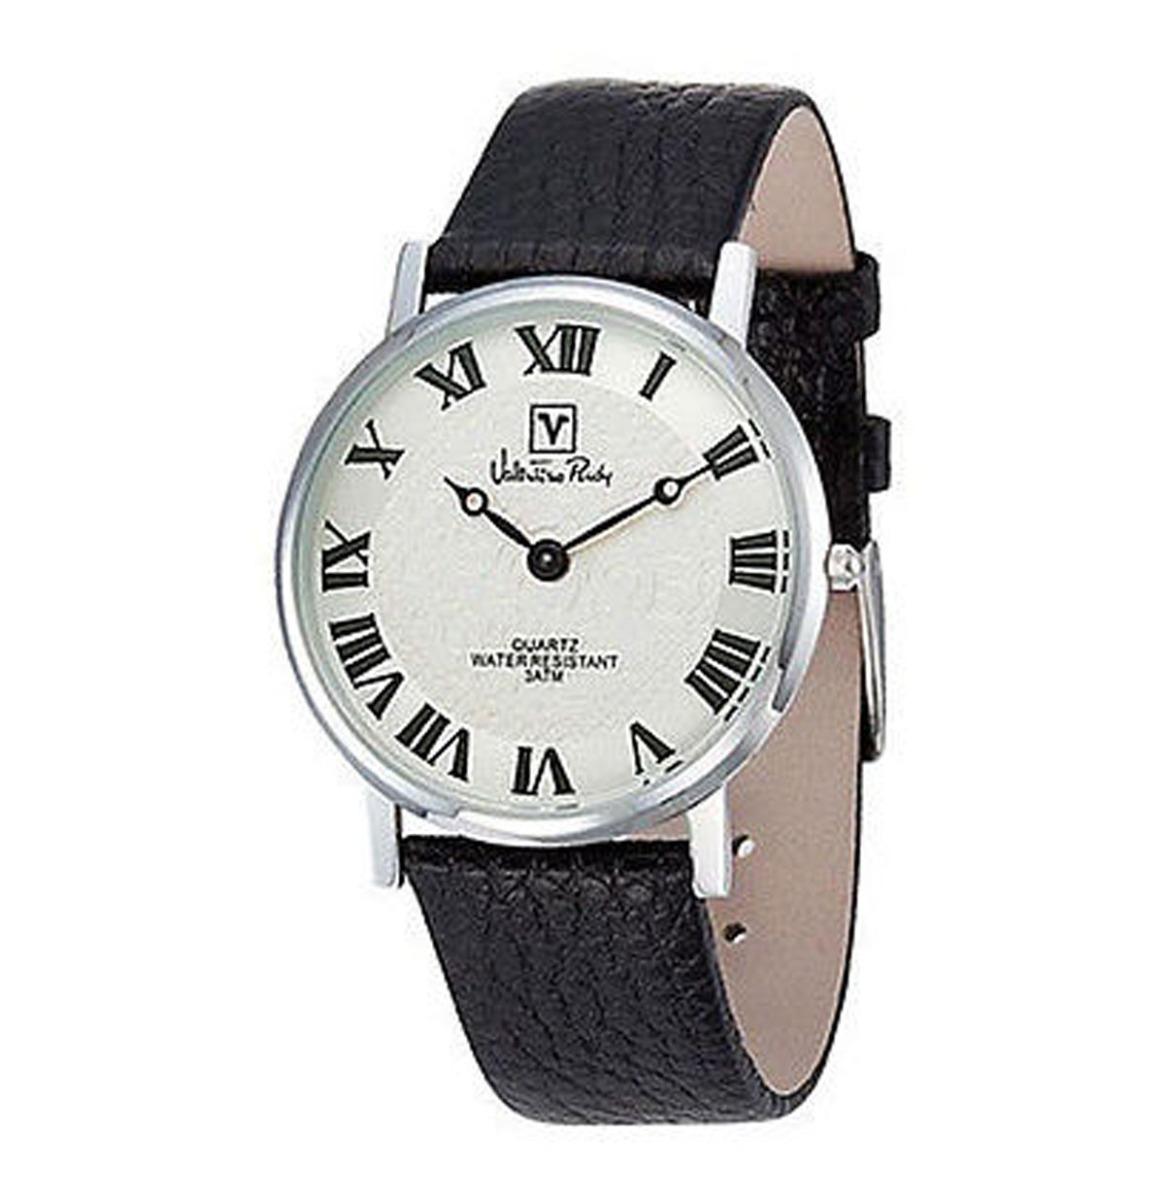 Valentino Rudy Round Face Leather Strap Heren Horloge Zilver